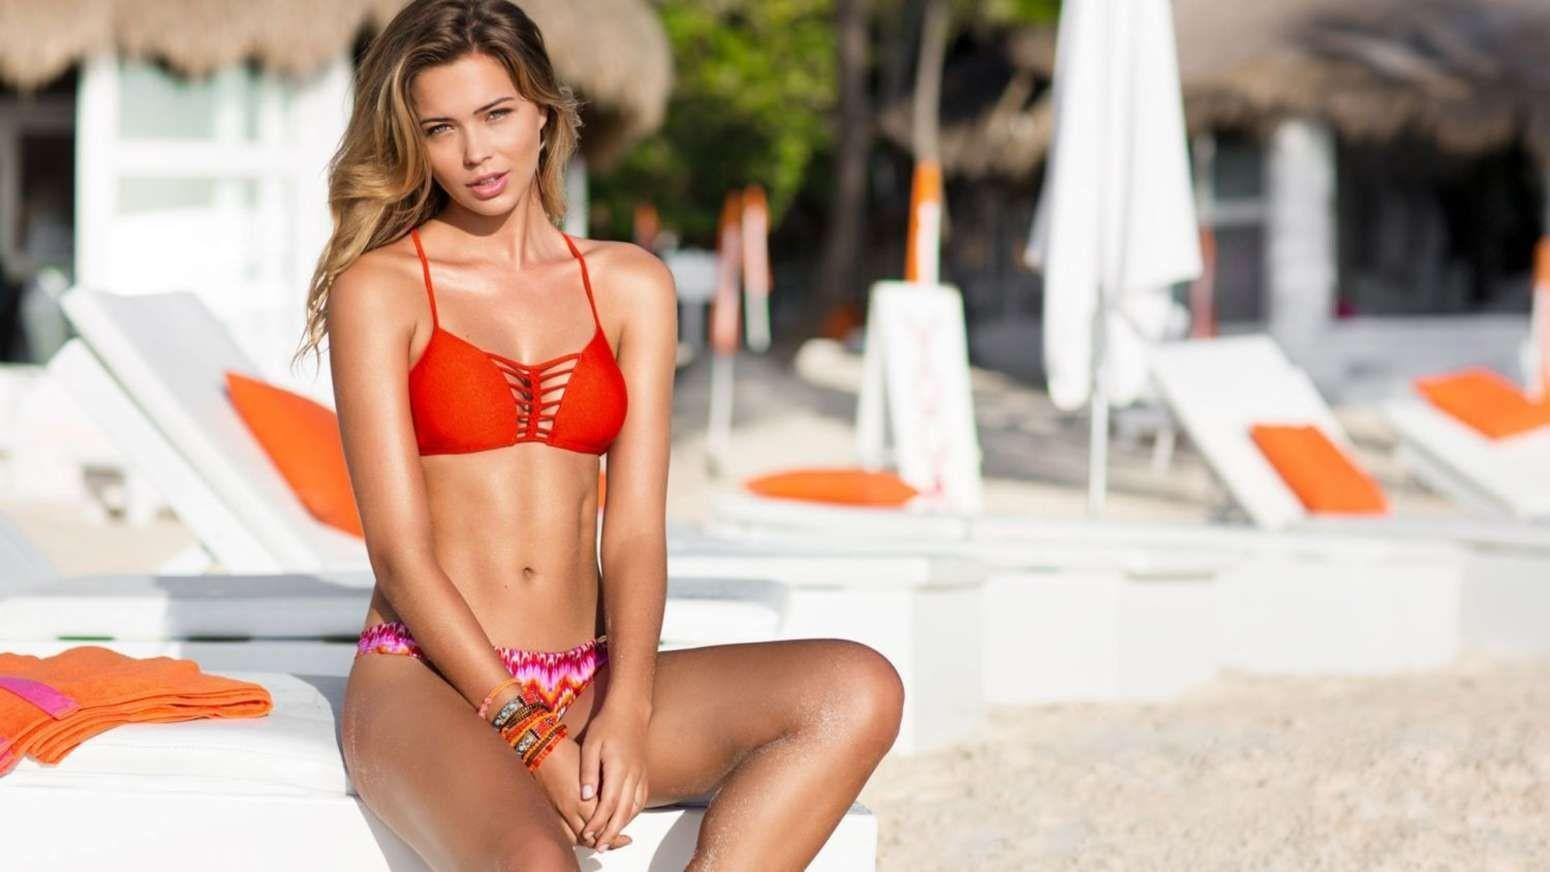 Sandra Kubicka Nude In Treats Magazine The Nip Slip